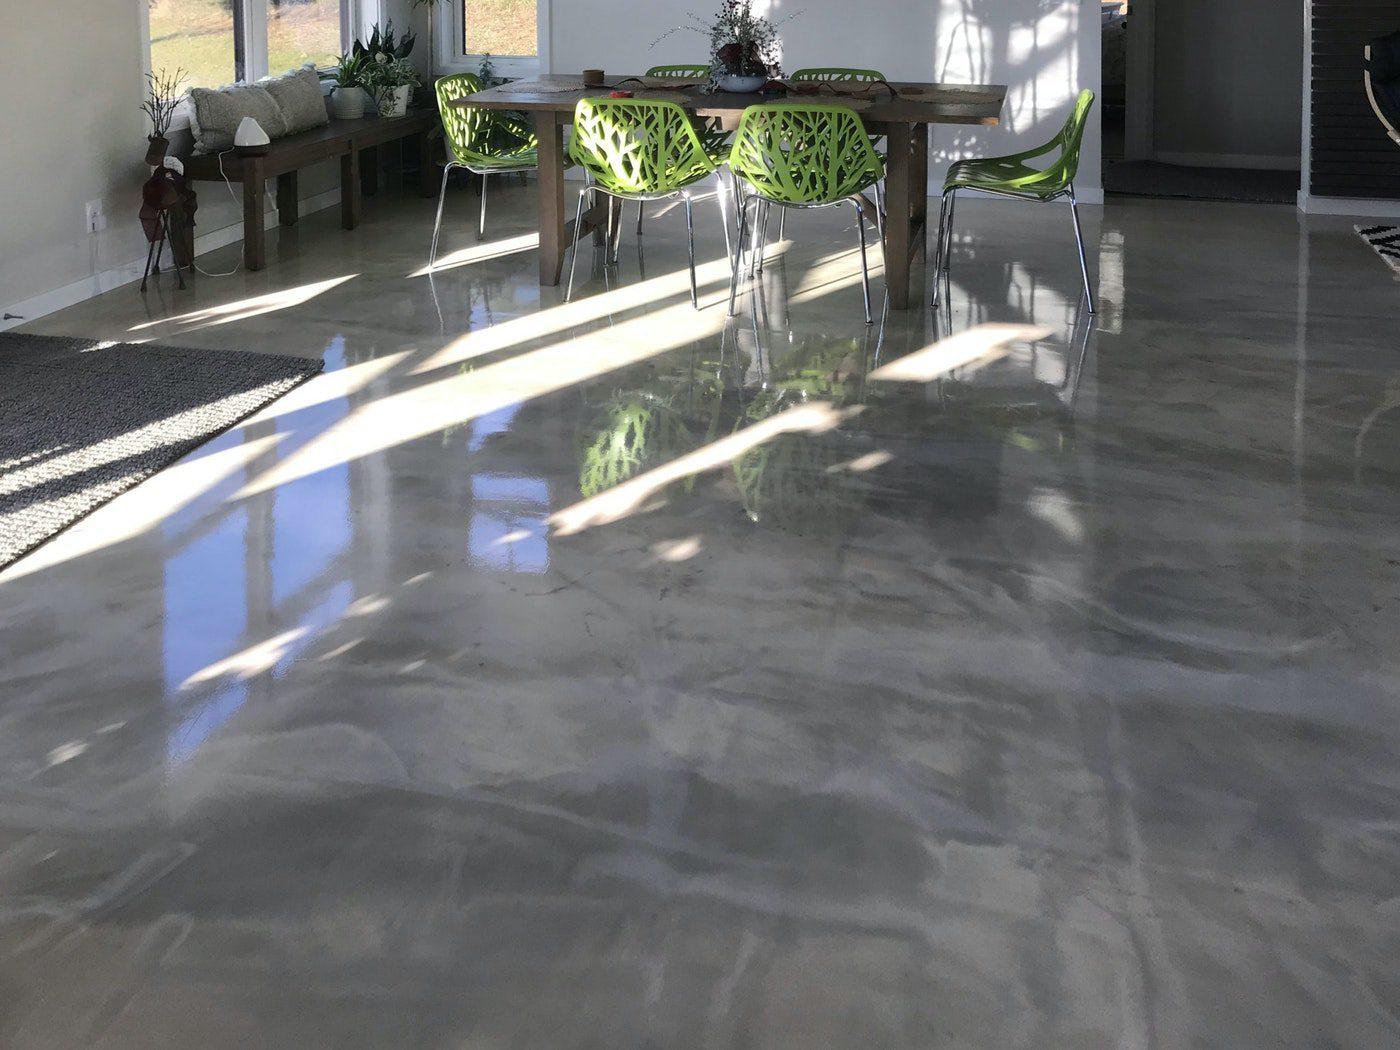 DIY Homeowner Metallic Epoxy Floor 04nbspDIY Homeowner Installs Designer Metallic Epoxy Floor Coating Throughout Home | Duraamen | Duraamen Engineered Products Inc